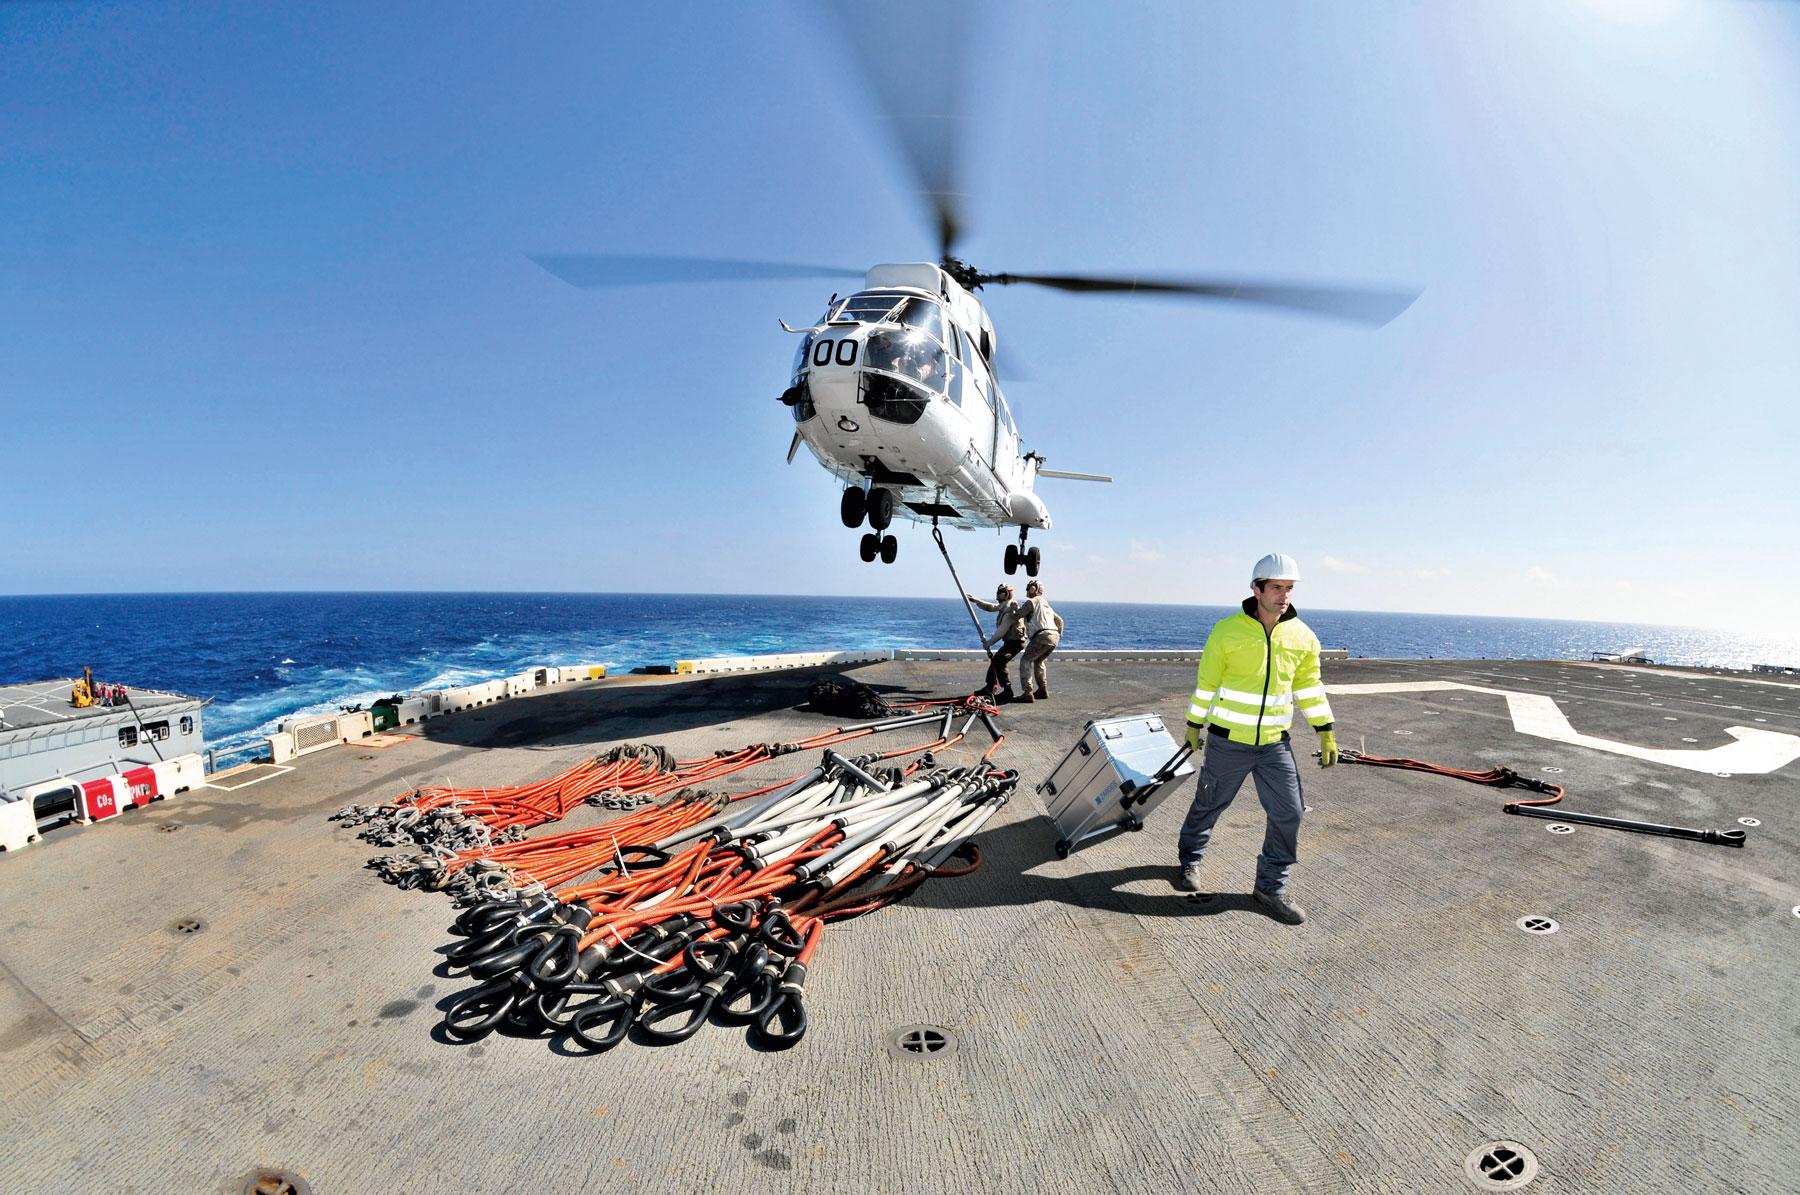 Cases for marine